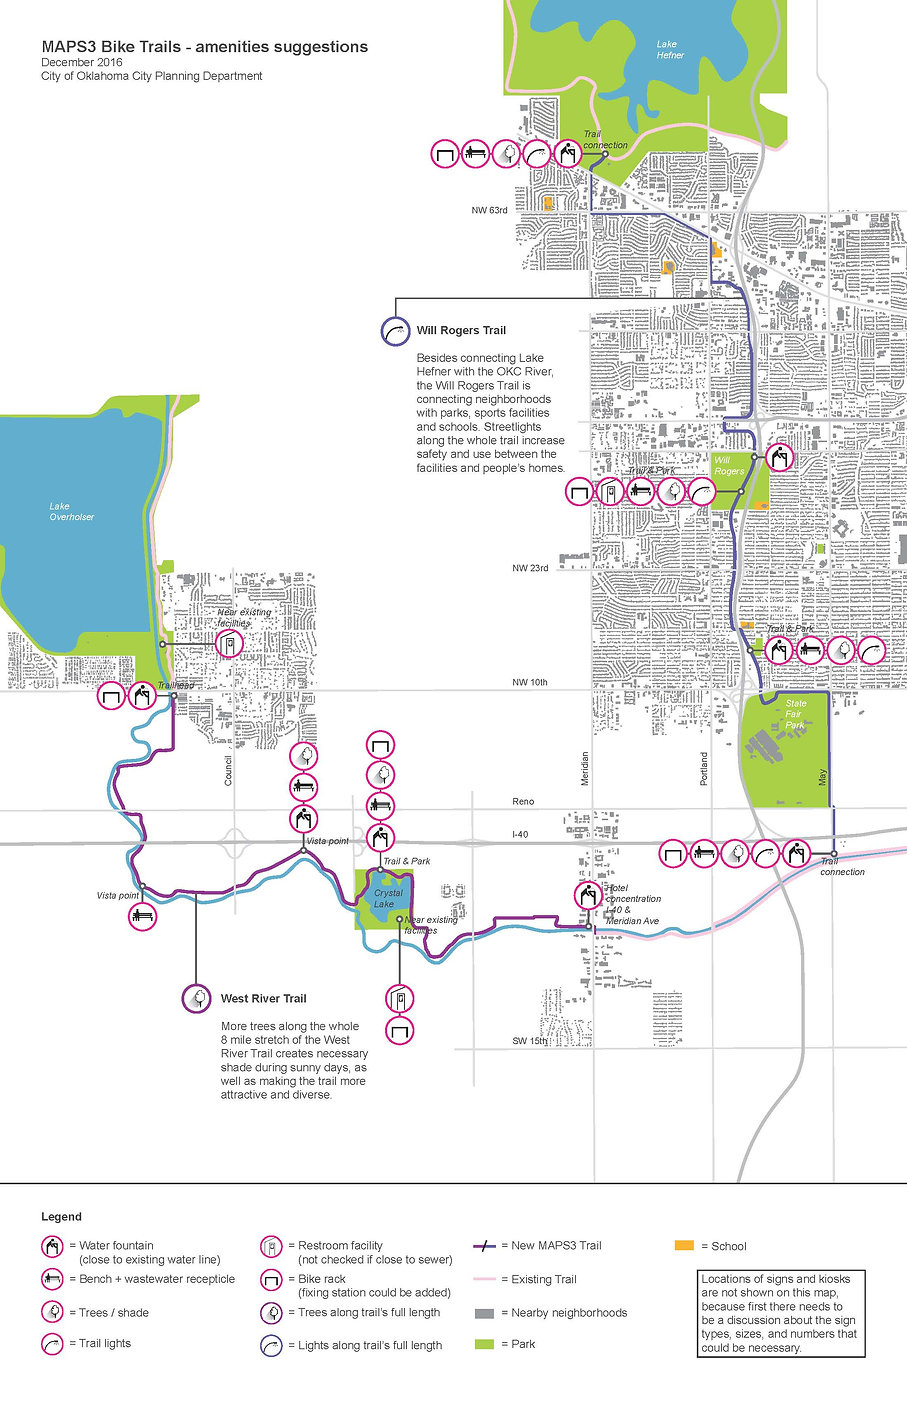 Bicycle trail amenities plan